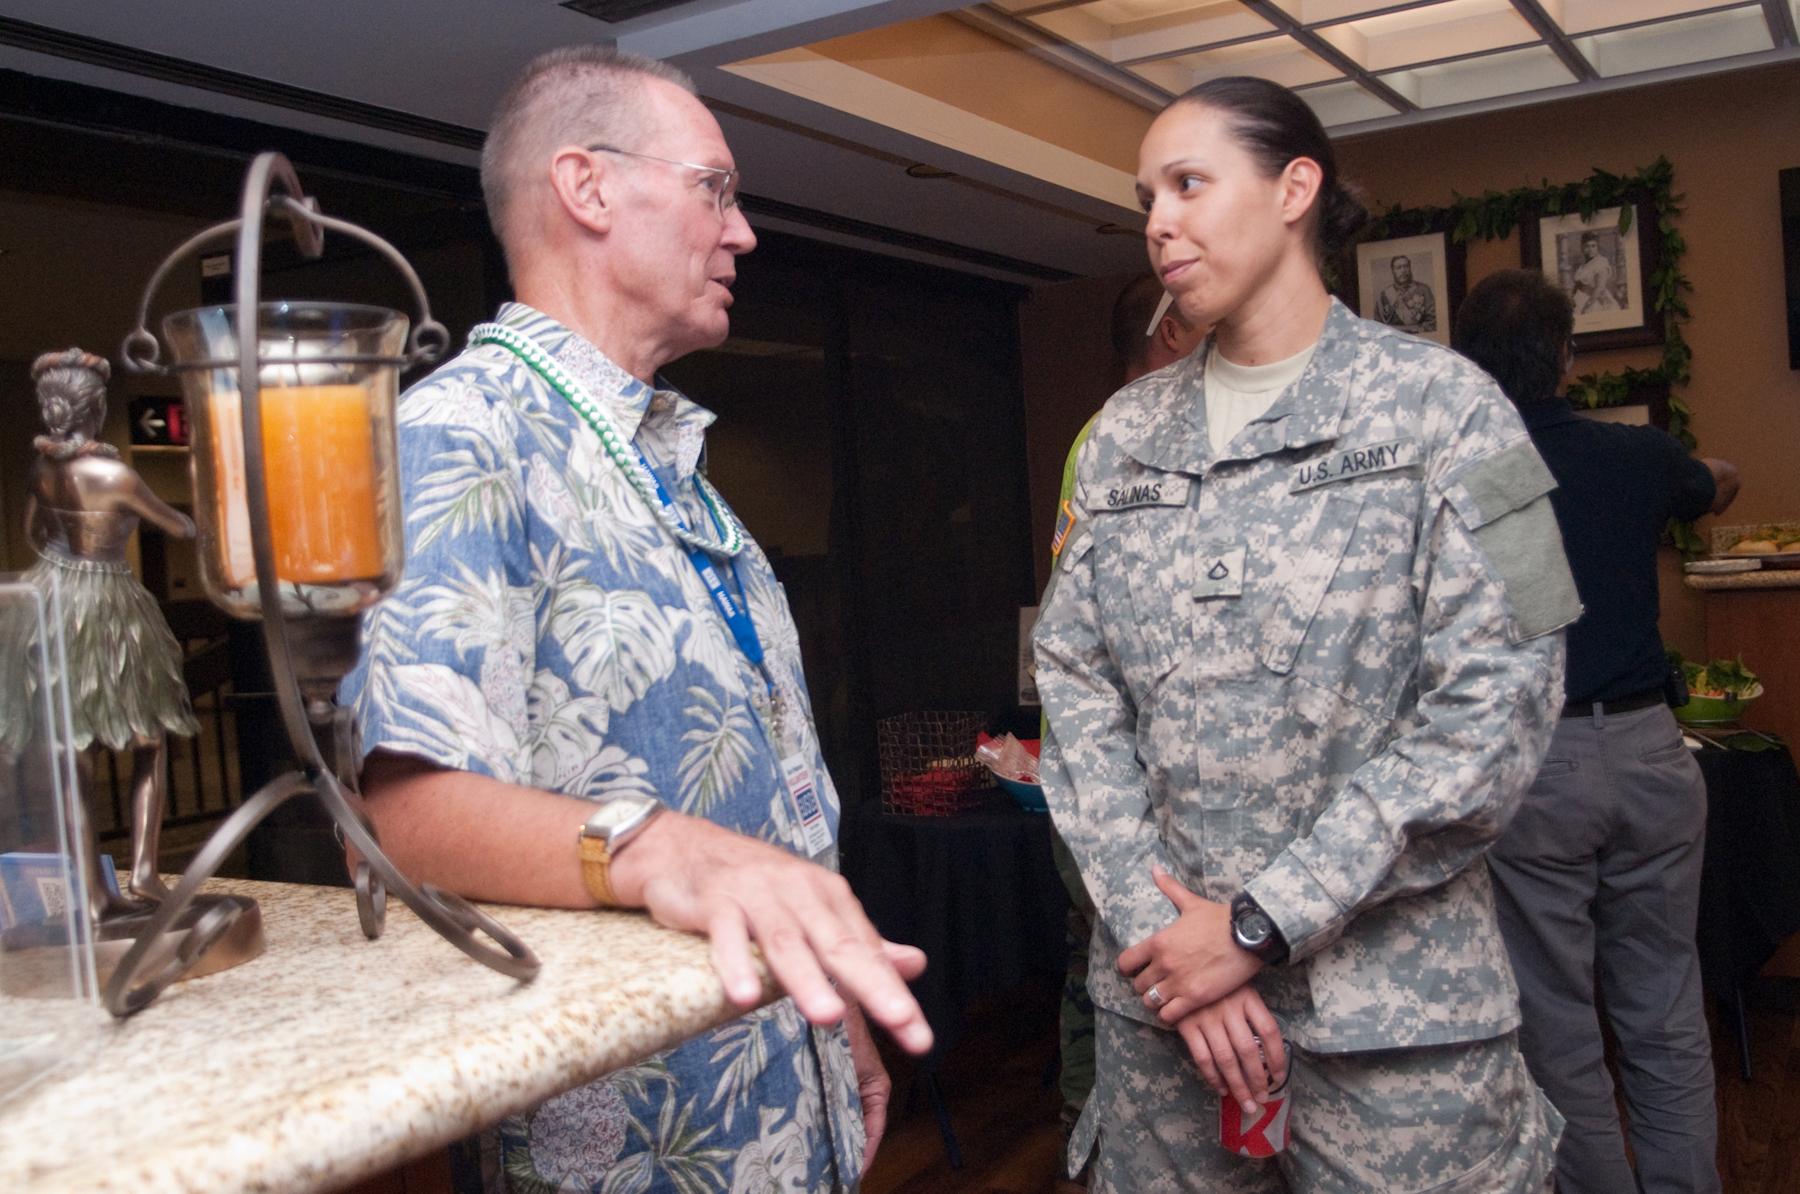 USO Hawaii celebrates airport center renovation in Honolulu 120204-M-TH981-002.jpg English: United Service Organizations volunteer Ron Peterson